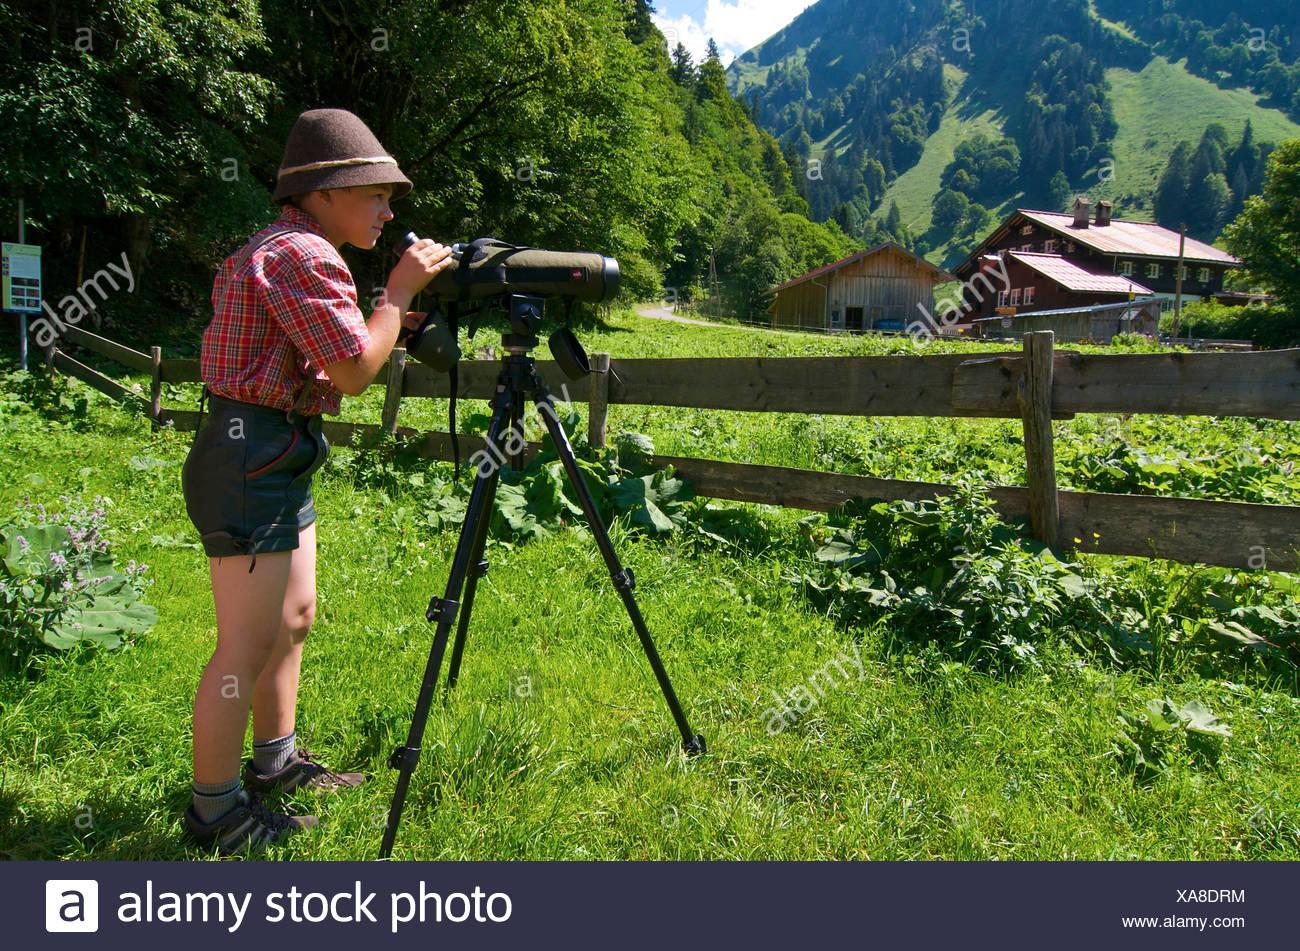 Eagle observatory at Giebelhaus in Hinterstein Valley, Bad Hindelang, Allgaeu, Bavaria, Germany, Europe - Stock Image